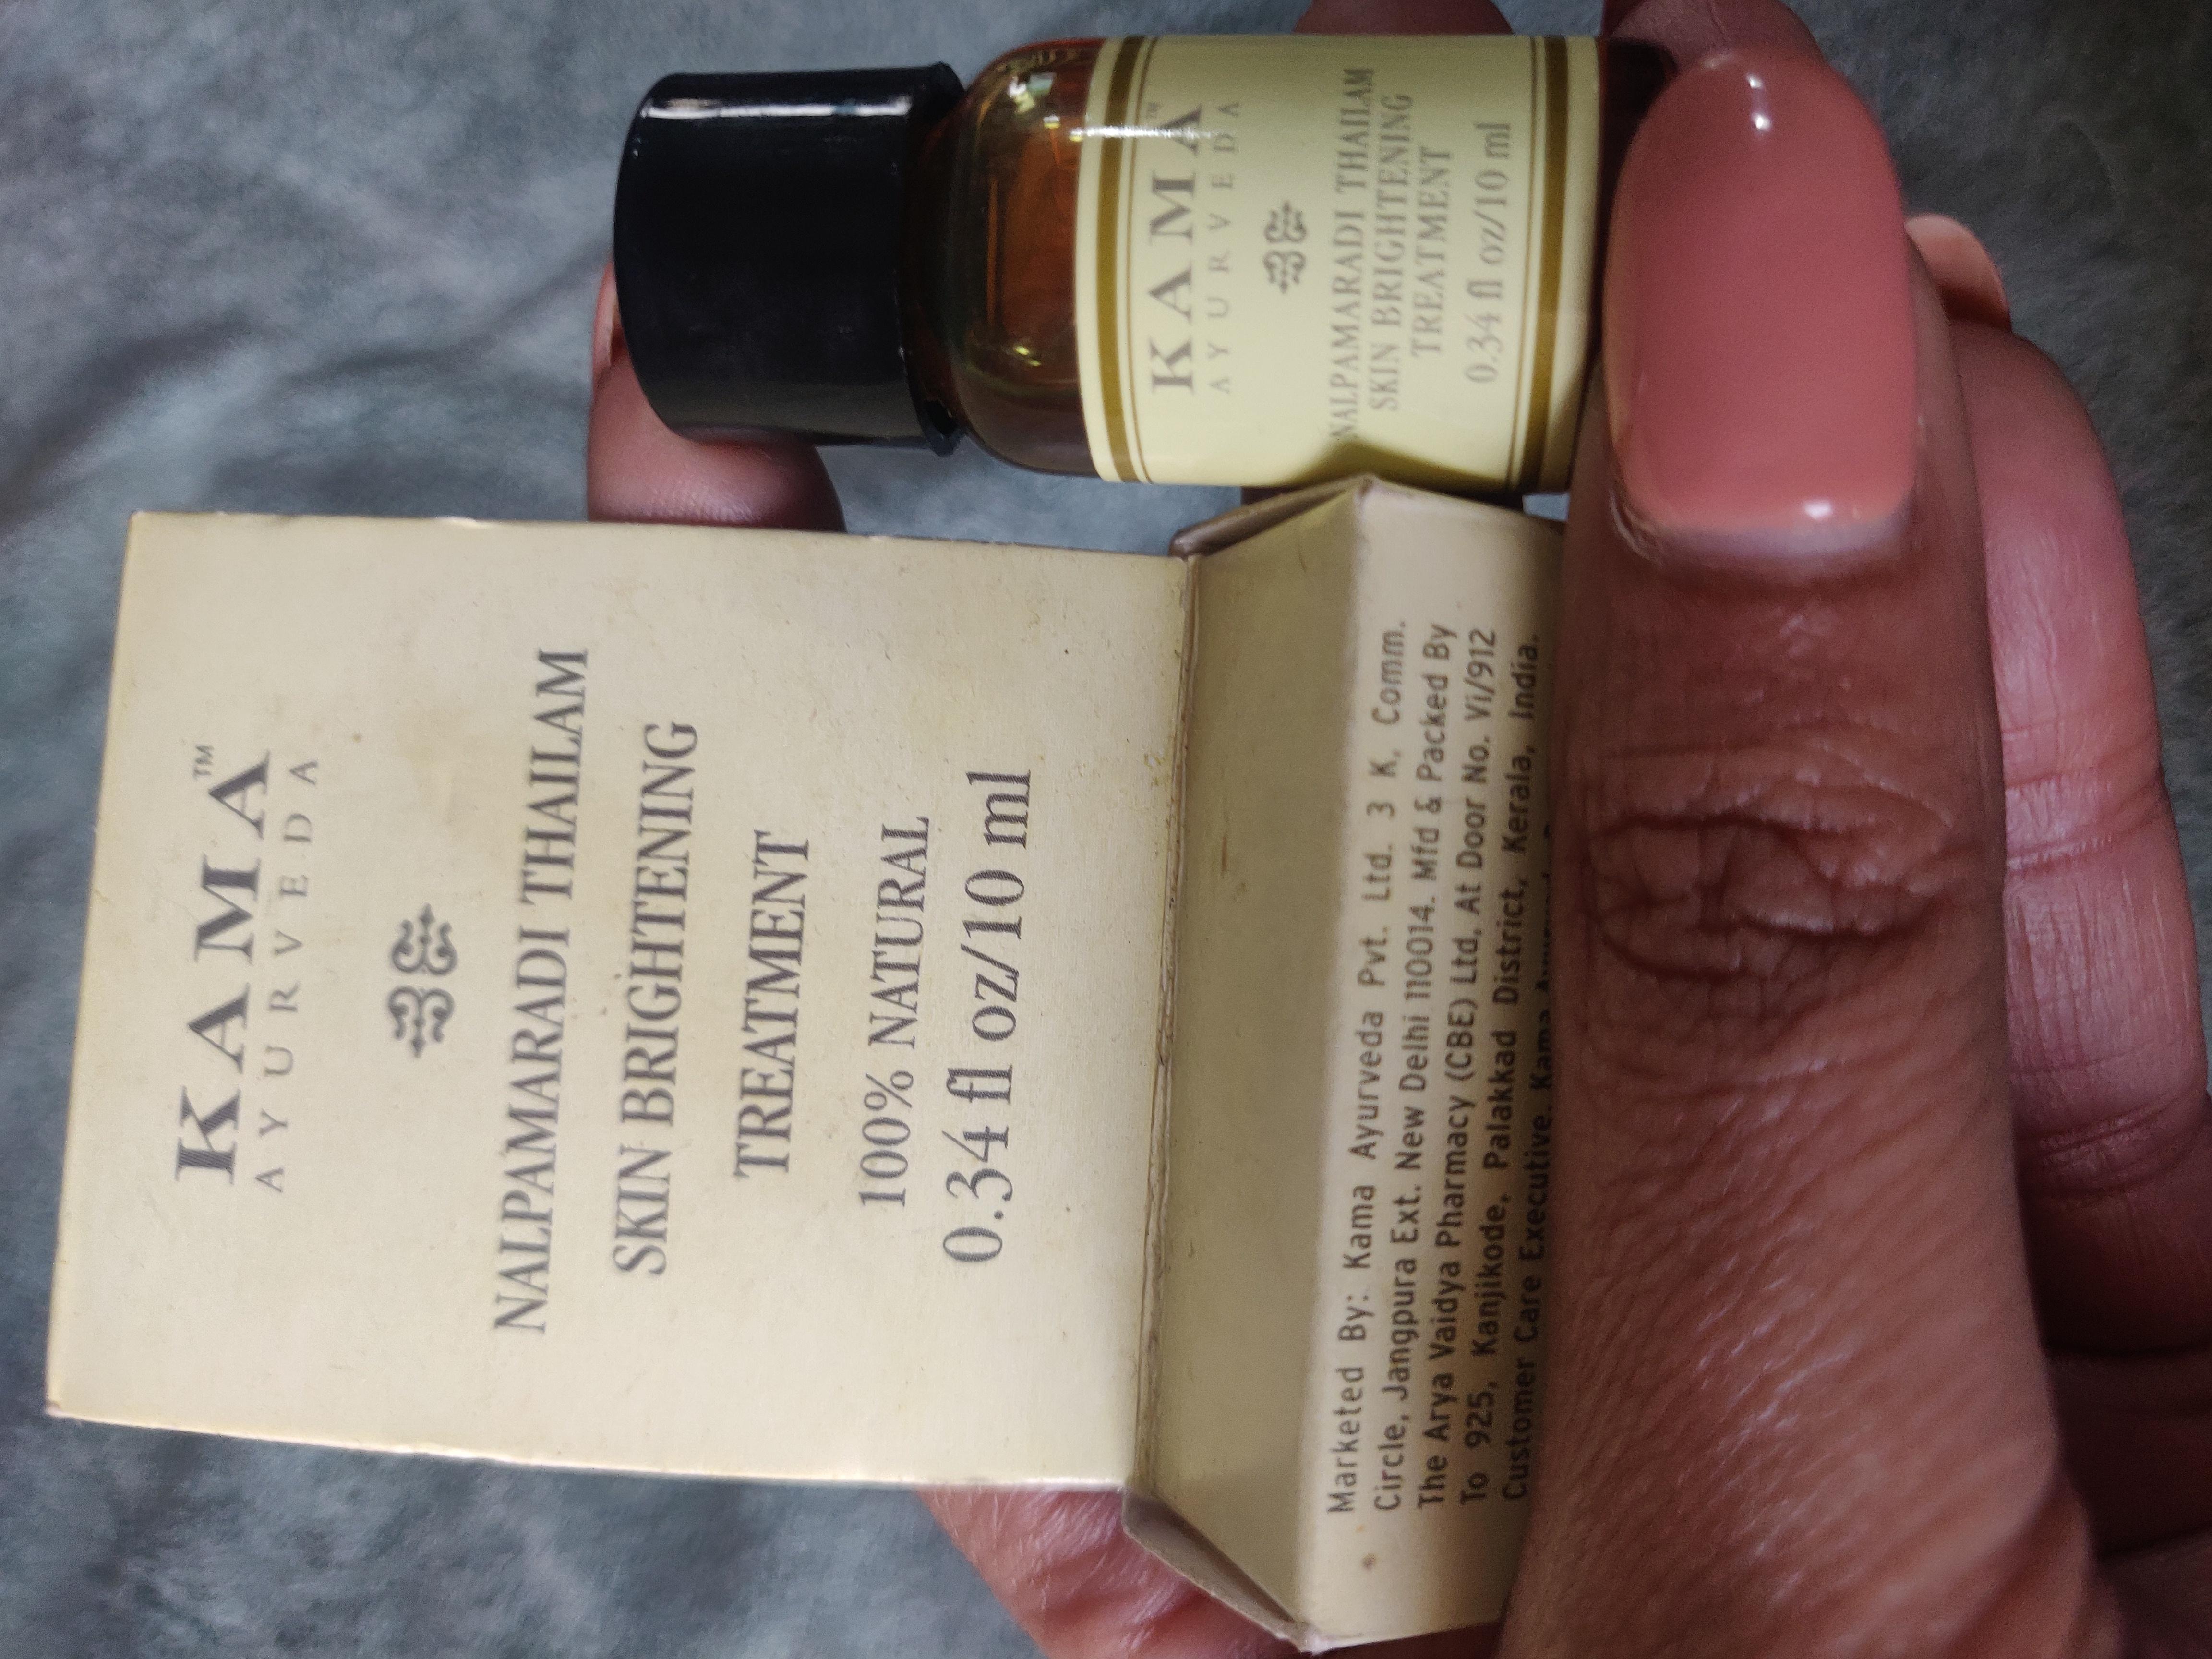 Kama Ayurveda Nalpamaradi Thailam Skin Brightening Treatment-My ayurveda potion-By apekshap